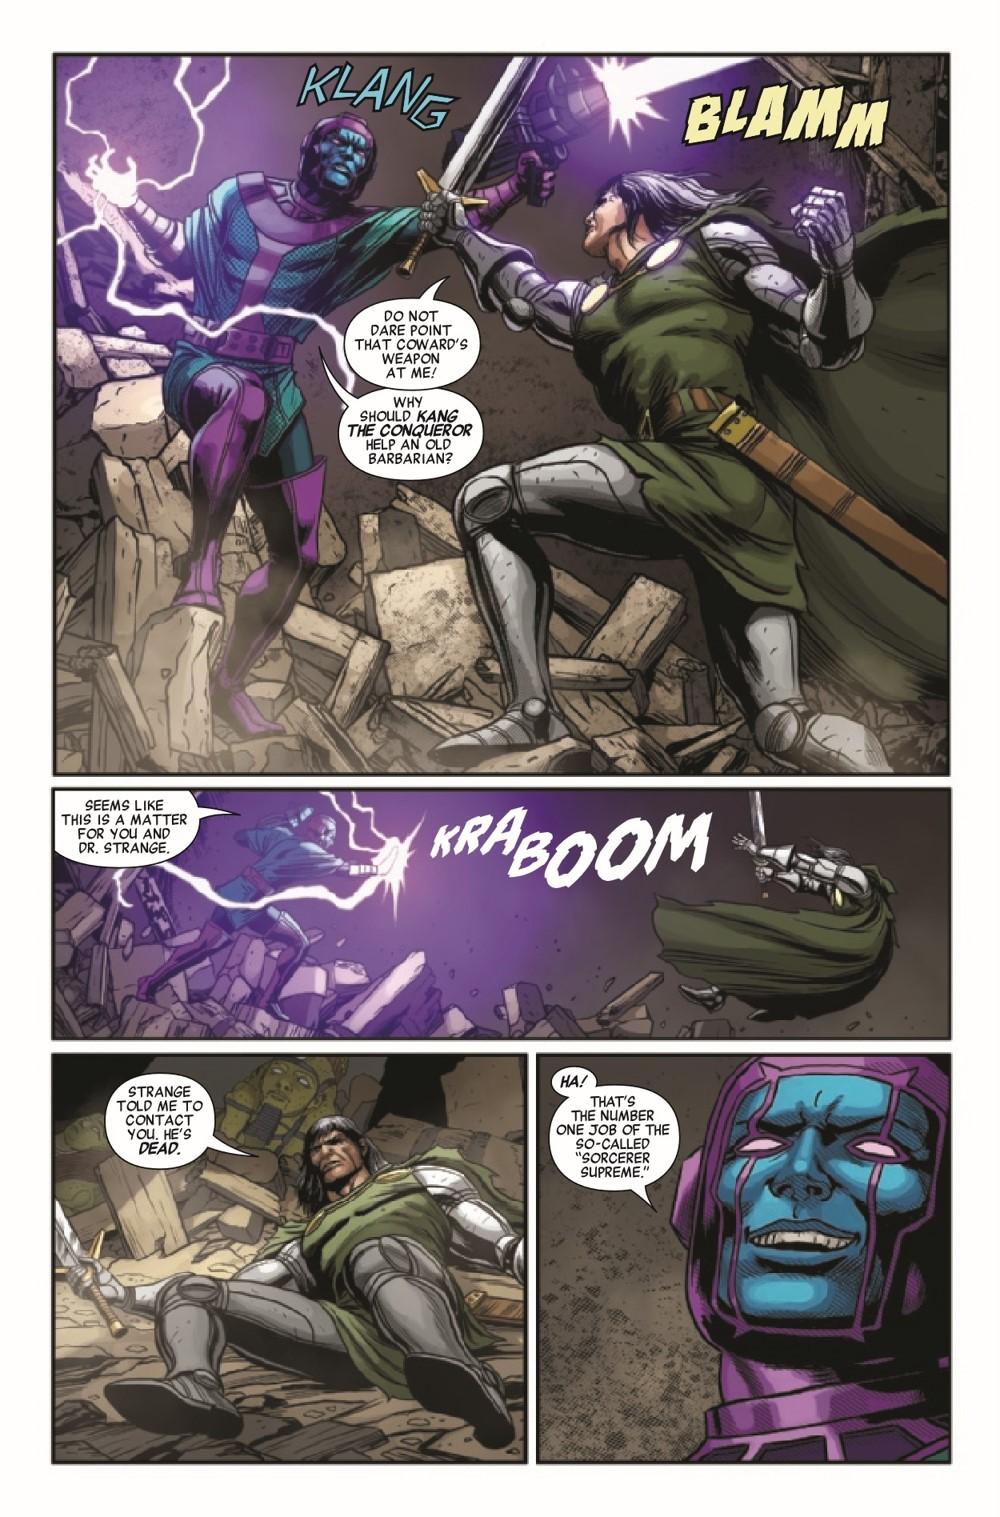 SAVAVEN2019025_Preview-3 ComicList Previews: SAVAGE AVENGERS #25